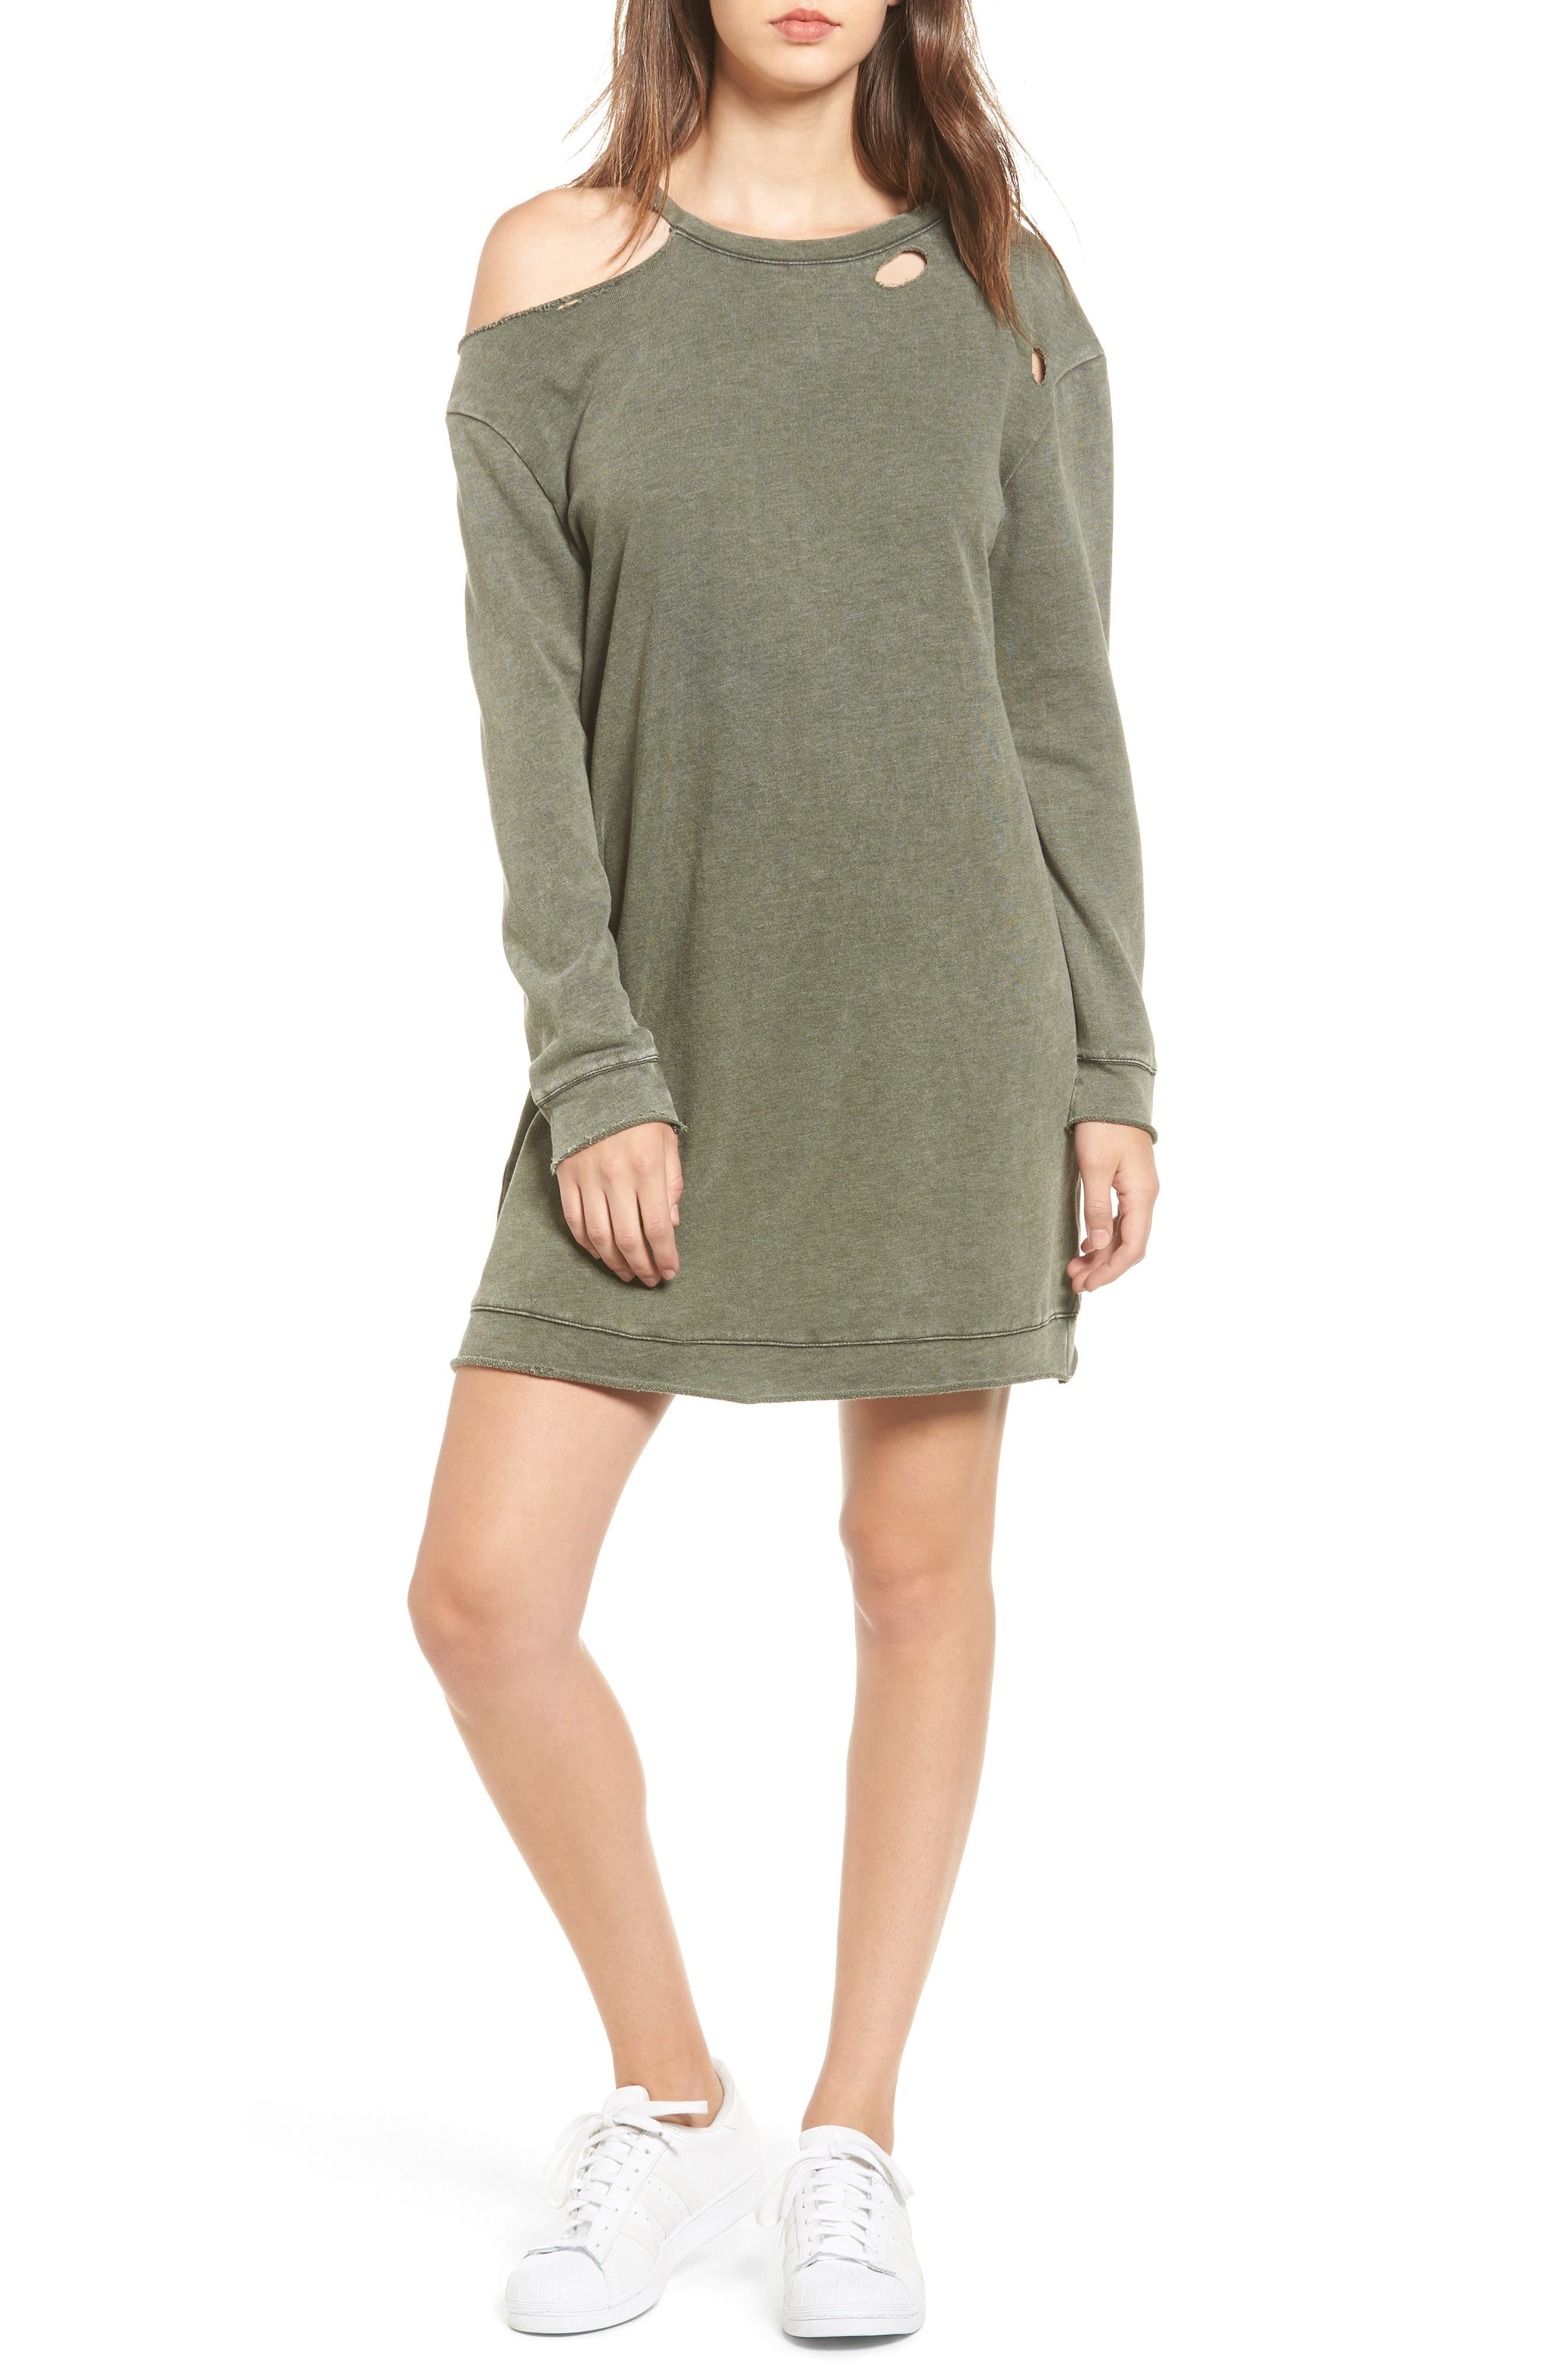 Ripped Sweatshirt Dress,                             Main thumbnail 1, color,                             309